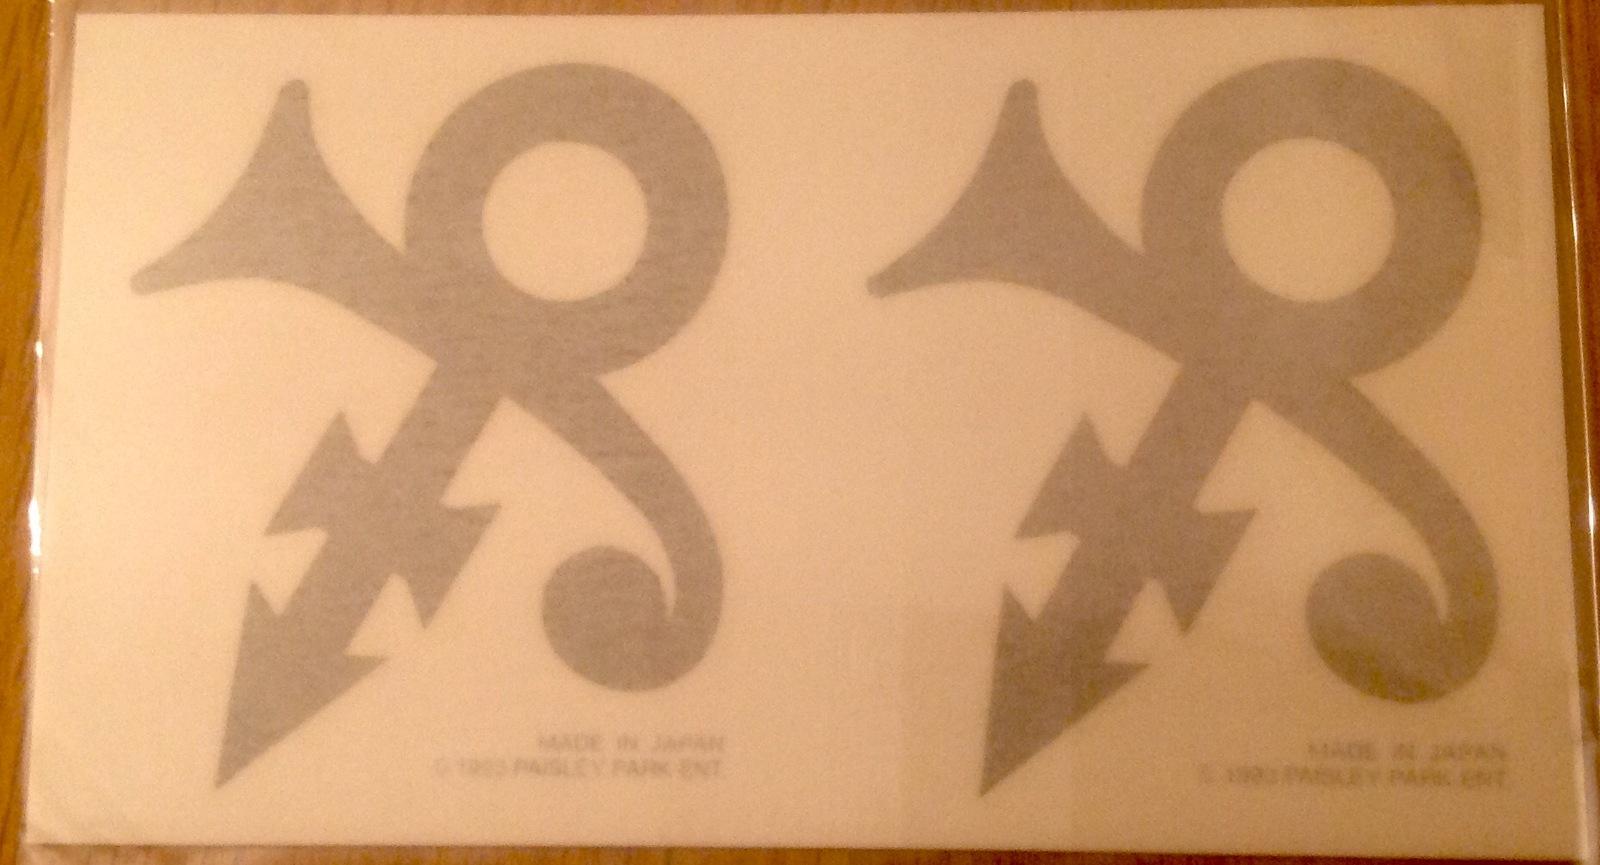 Prince Gold Symbol Tattoos 1993 Paisley And 16 Similar Items